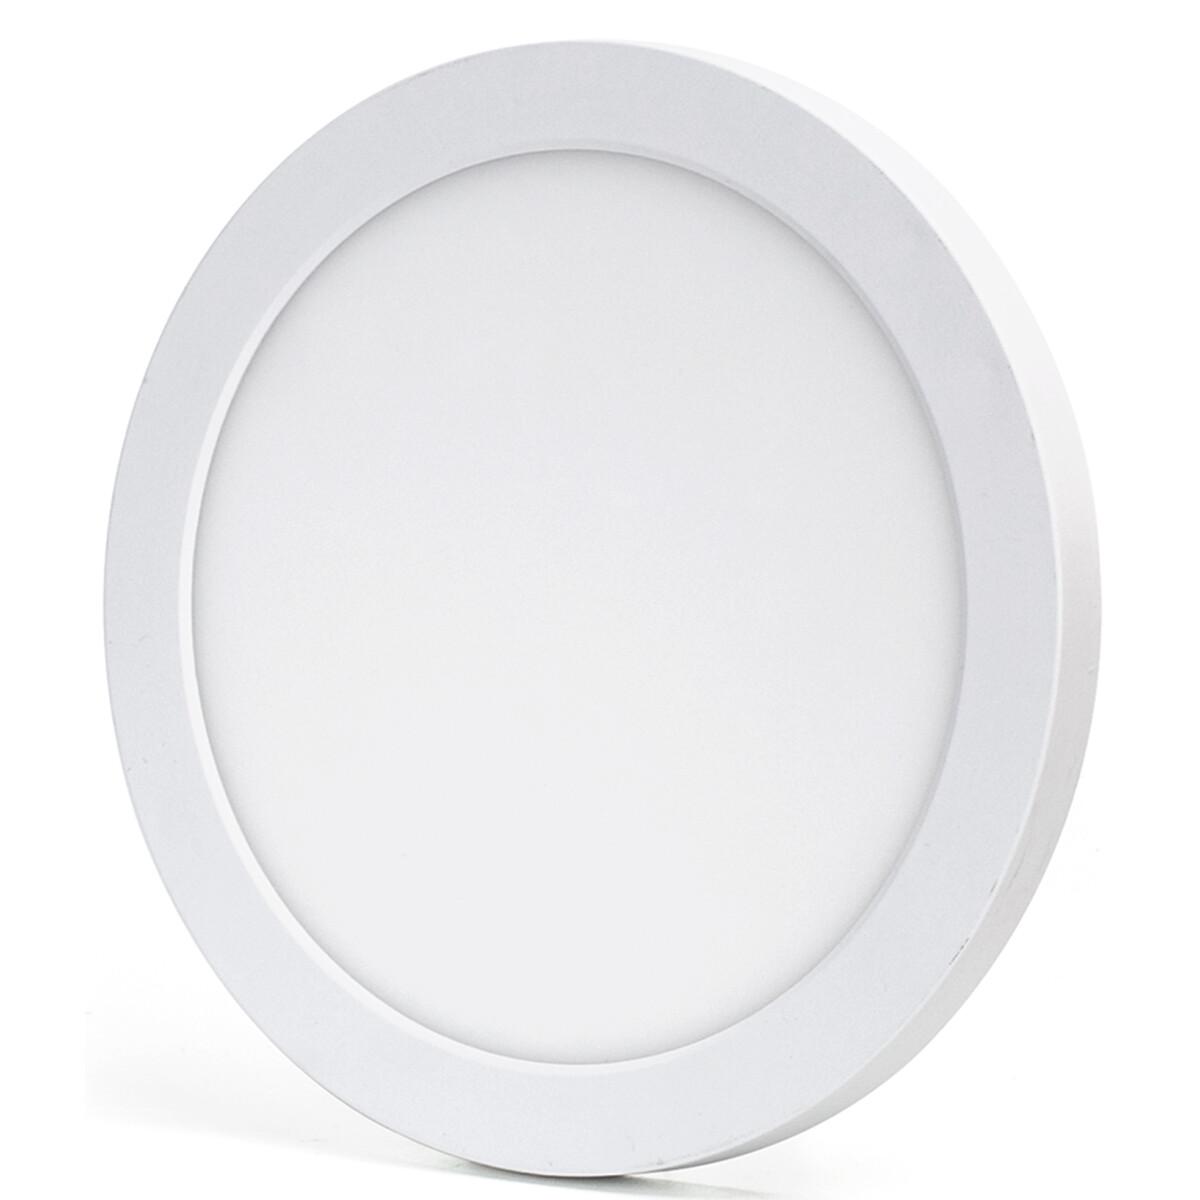 LED Downlight Pro - Aigi Foka - Inbouw/Opbouw - Rond - 18W - Aanpasbare Kleur CCT - Mat Wit - Kunststof